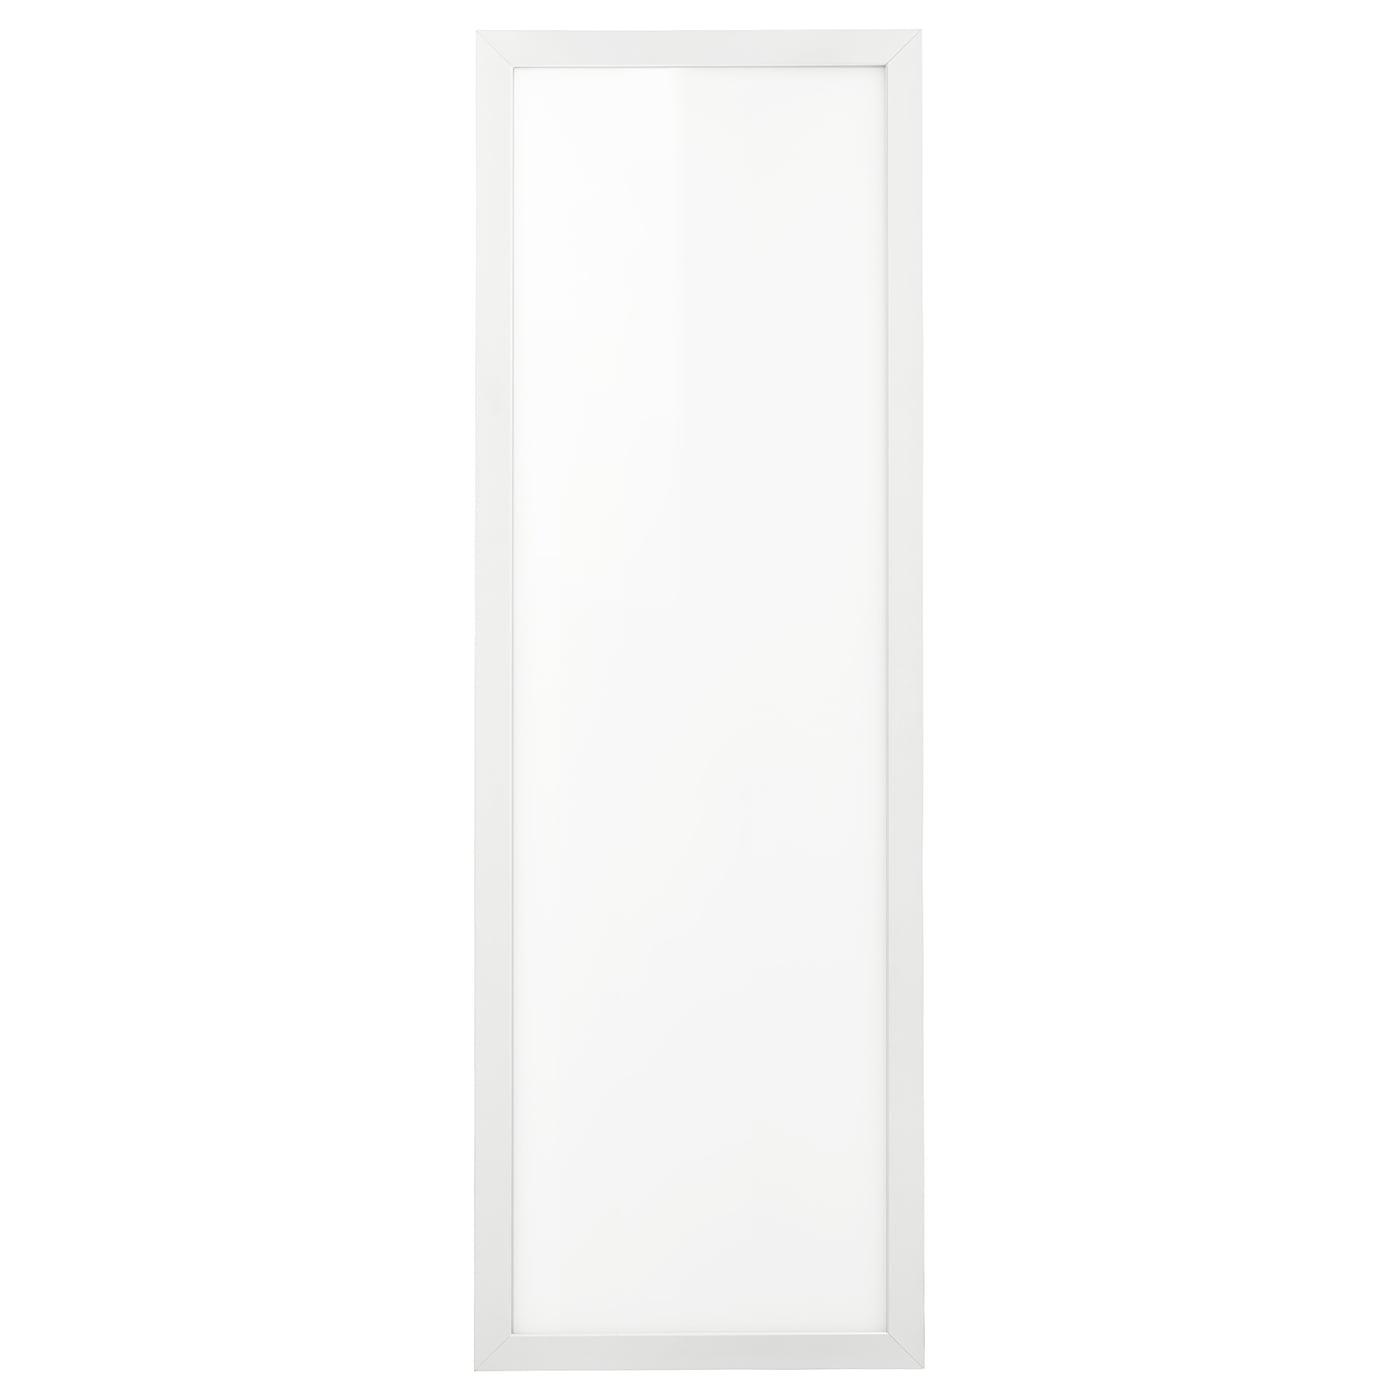 Floalt Led Lichtpaneel Dimmbar Weissspektrum 30x90 Cm Ikea Deutschland